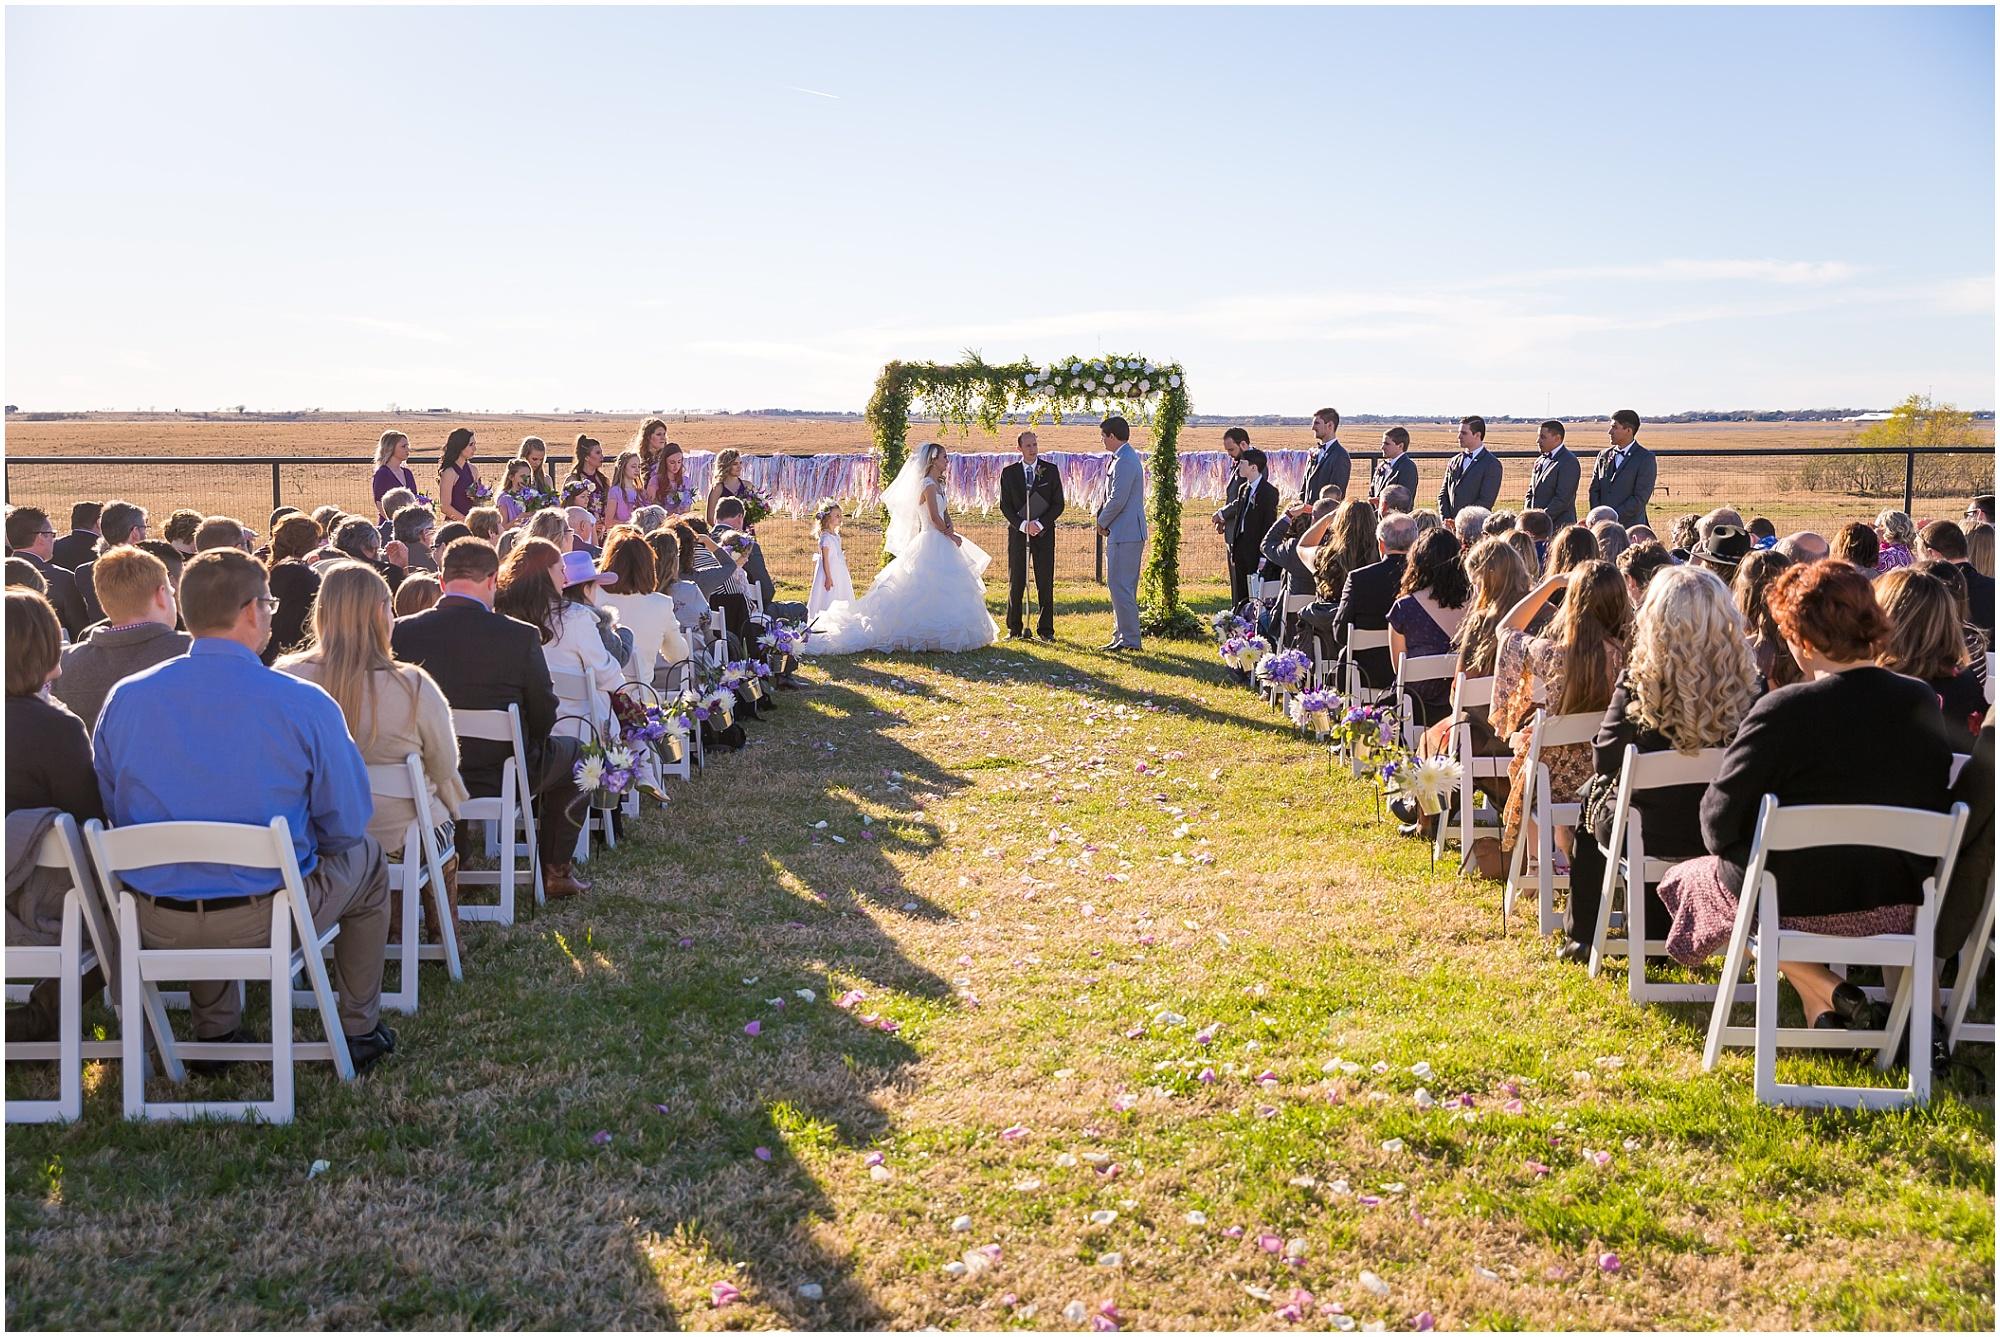 Sunny December wedding at The Barn at 5 S Ranch in Thrall, Texas - Jason & Melaina Photography - www.jasonandmelaina.com